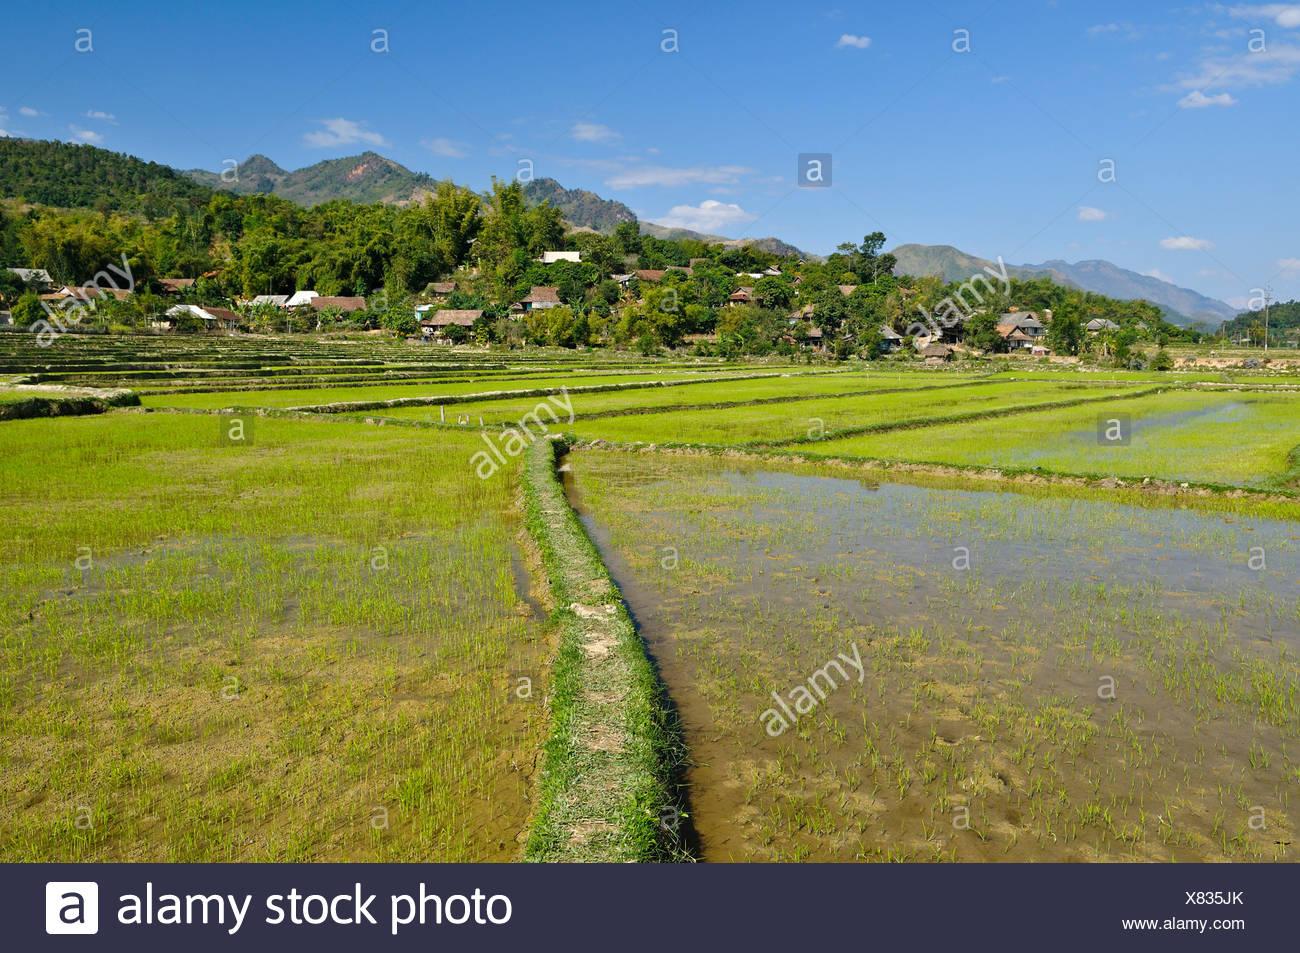 Mai Chau Valley, Vietnam, Asia - Stock Image